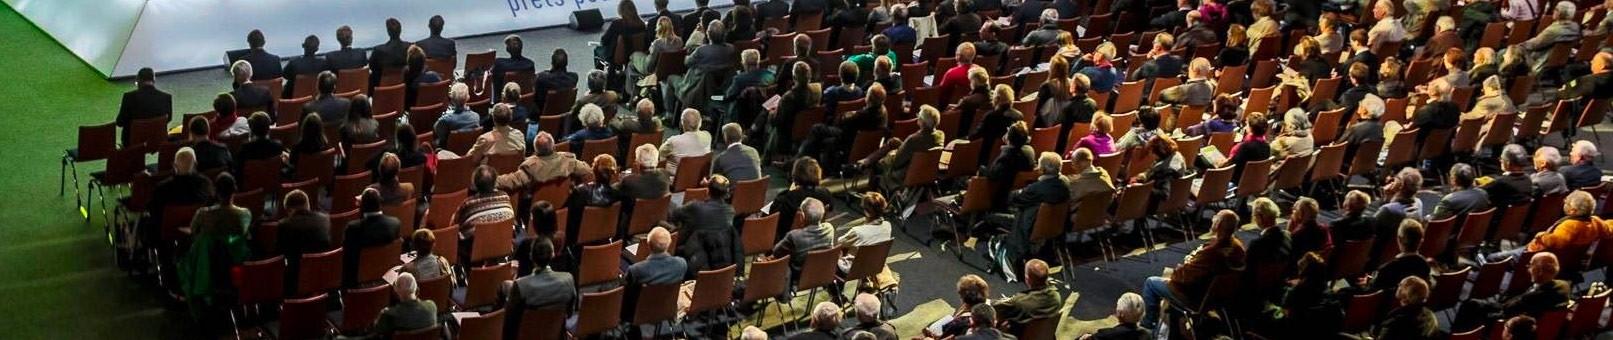 SUEZ annual general meetings 2016